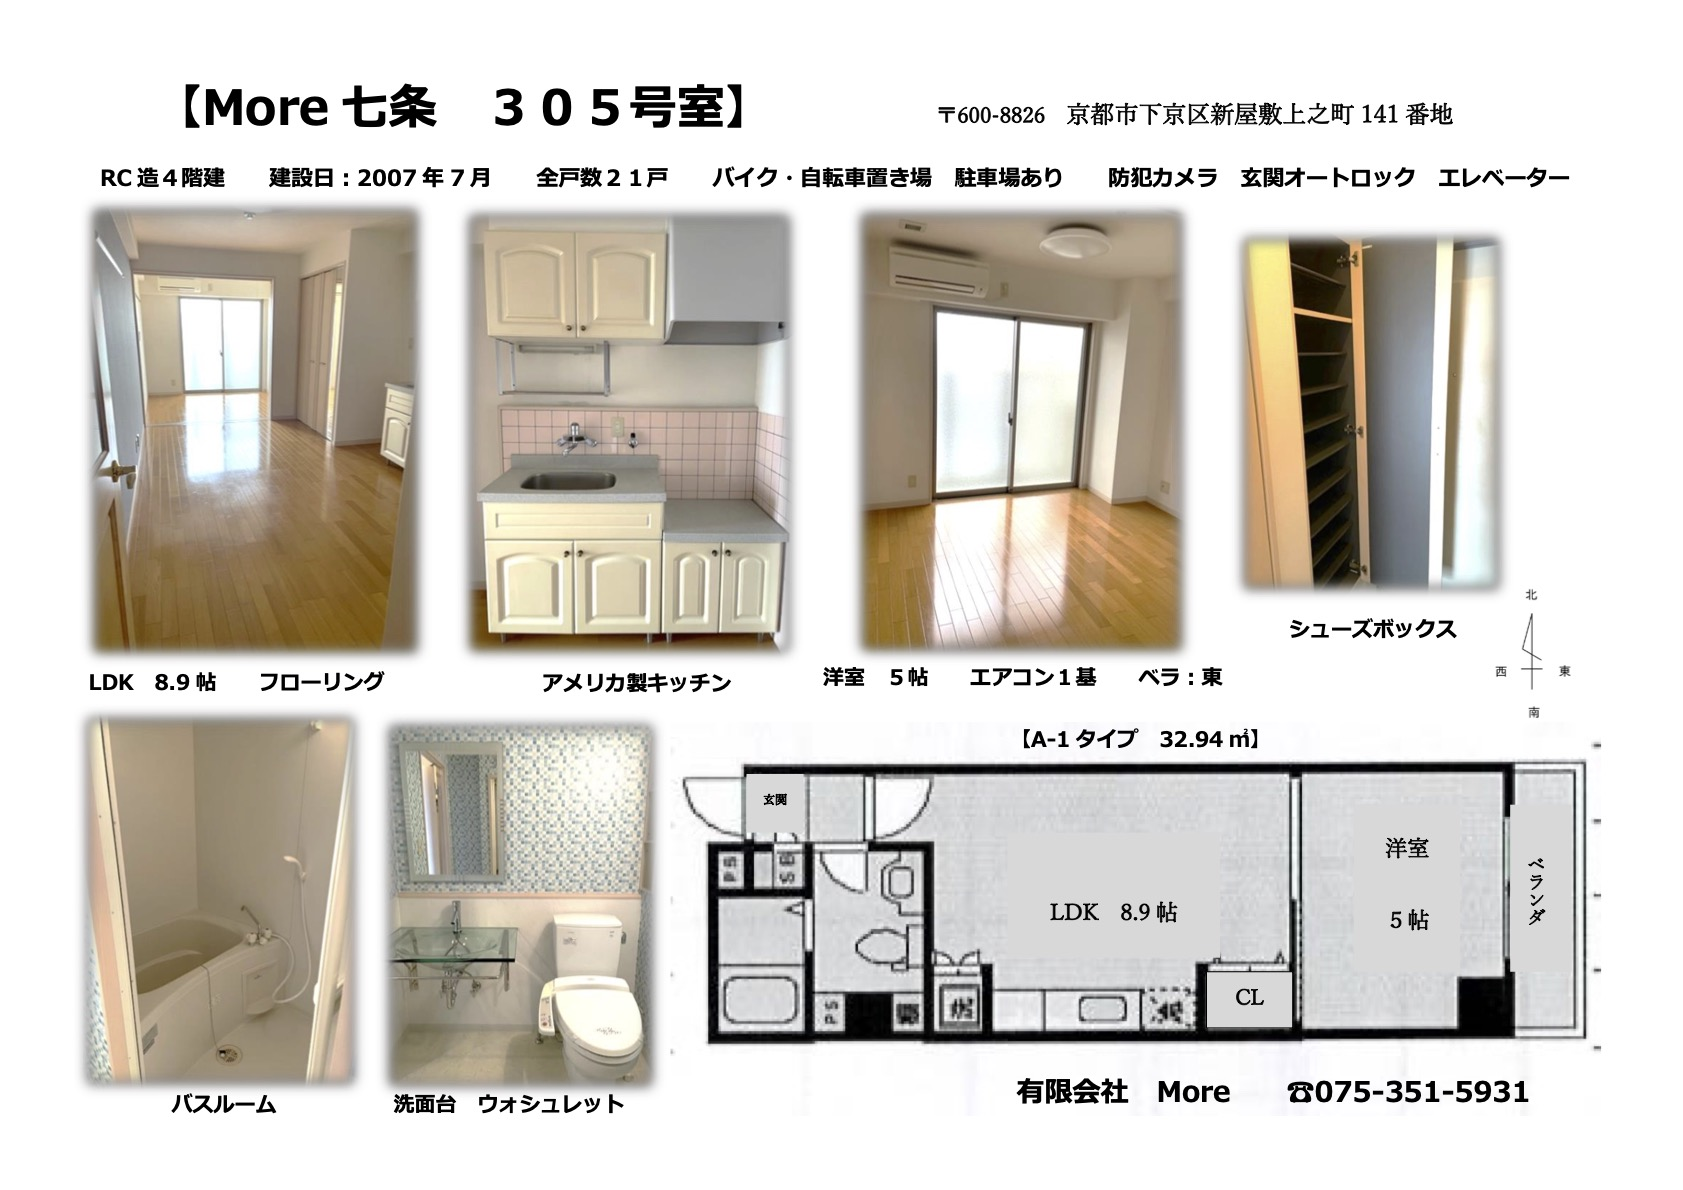 More七条 305号室